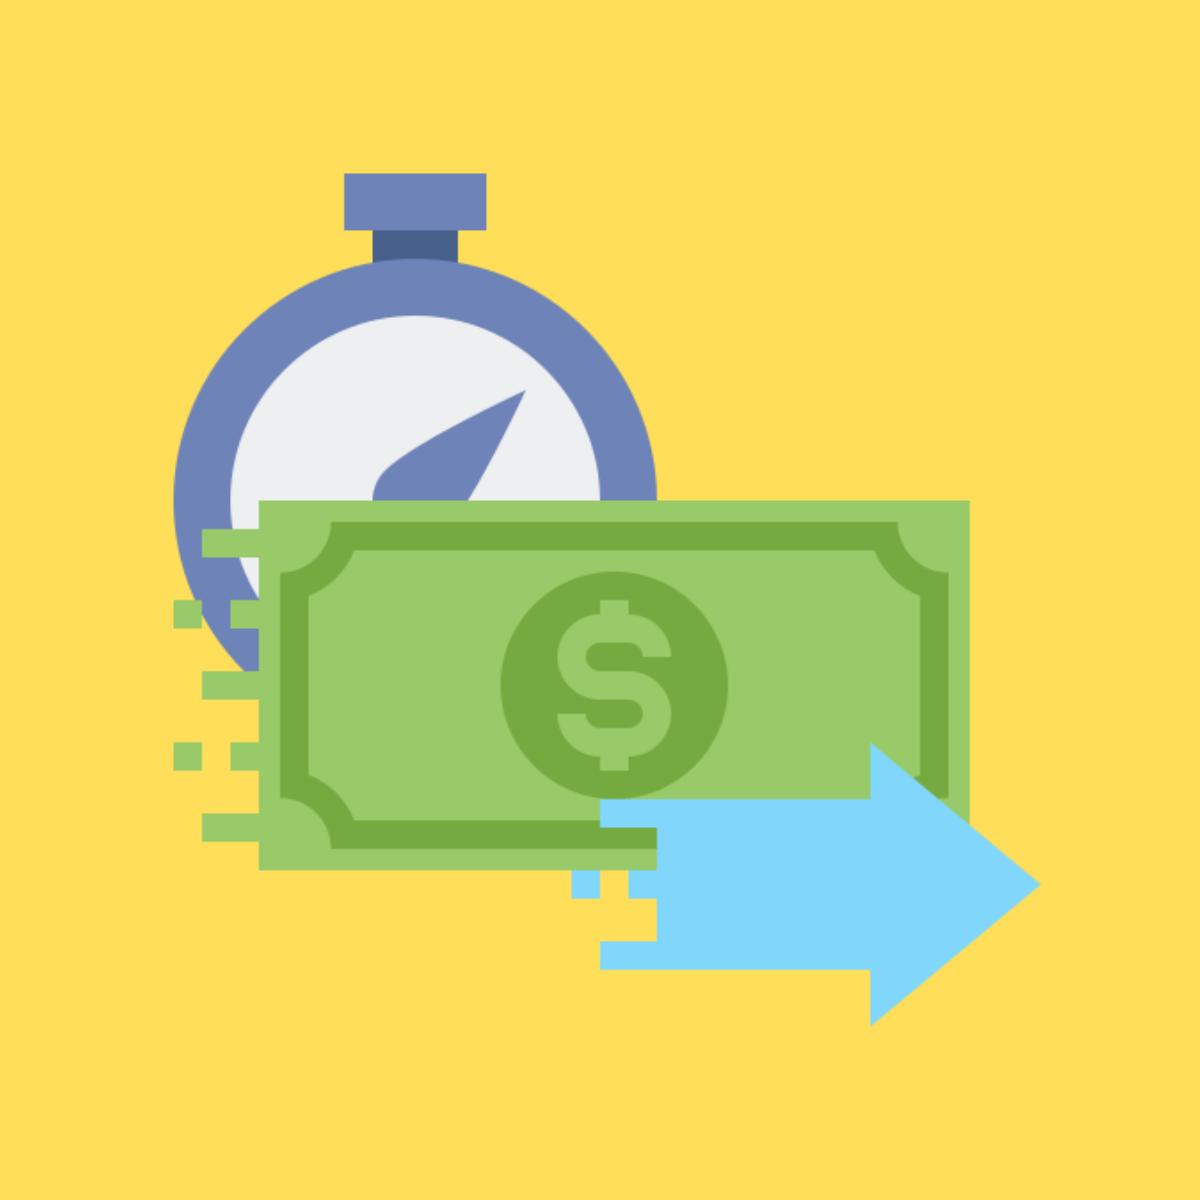 How Do I Transfer Money to a Bank Account?